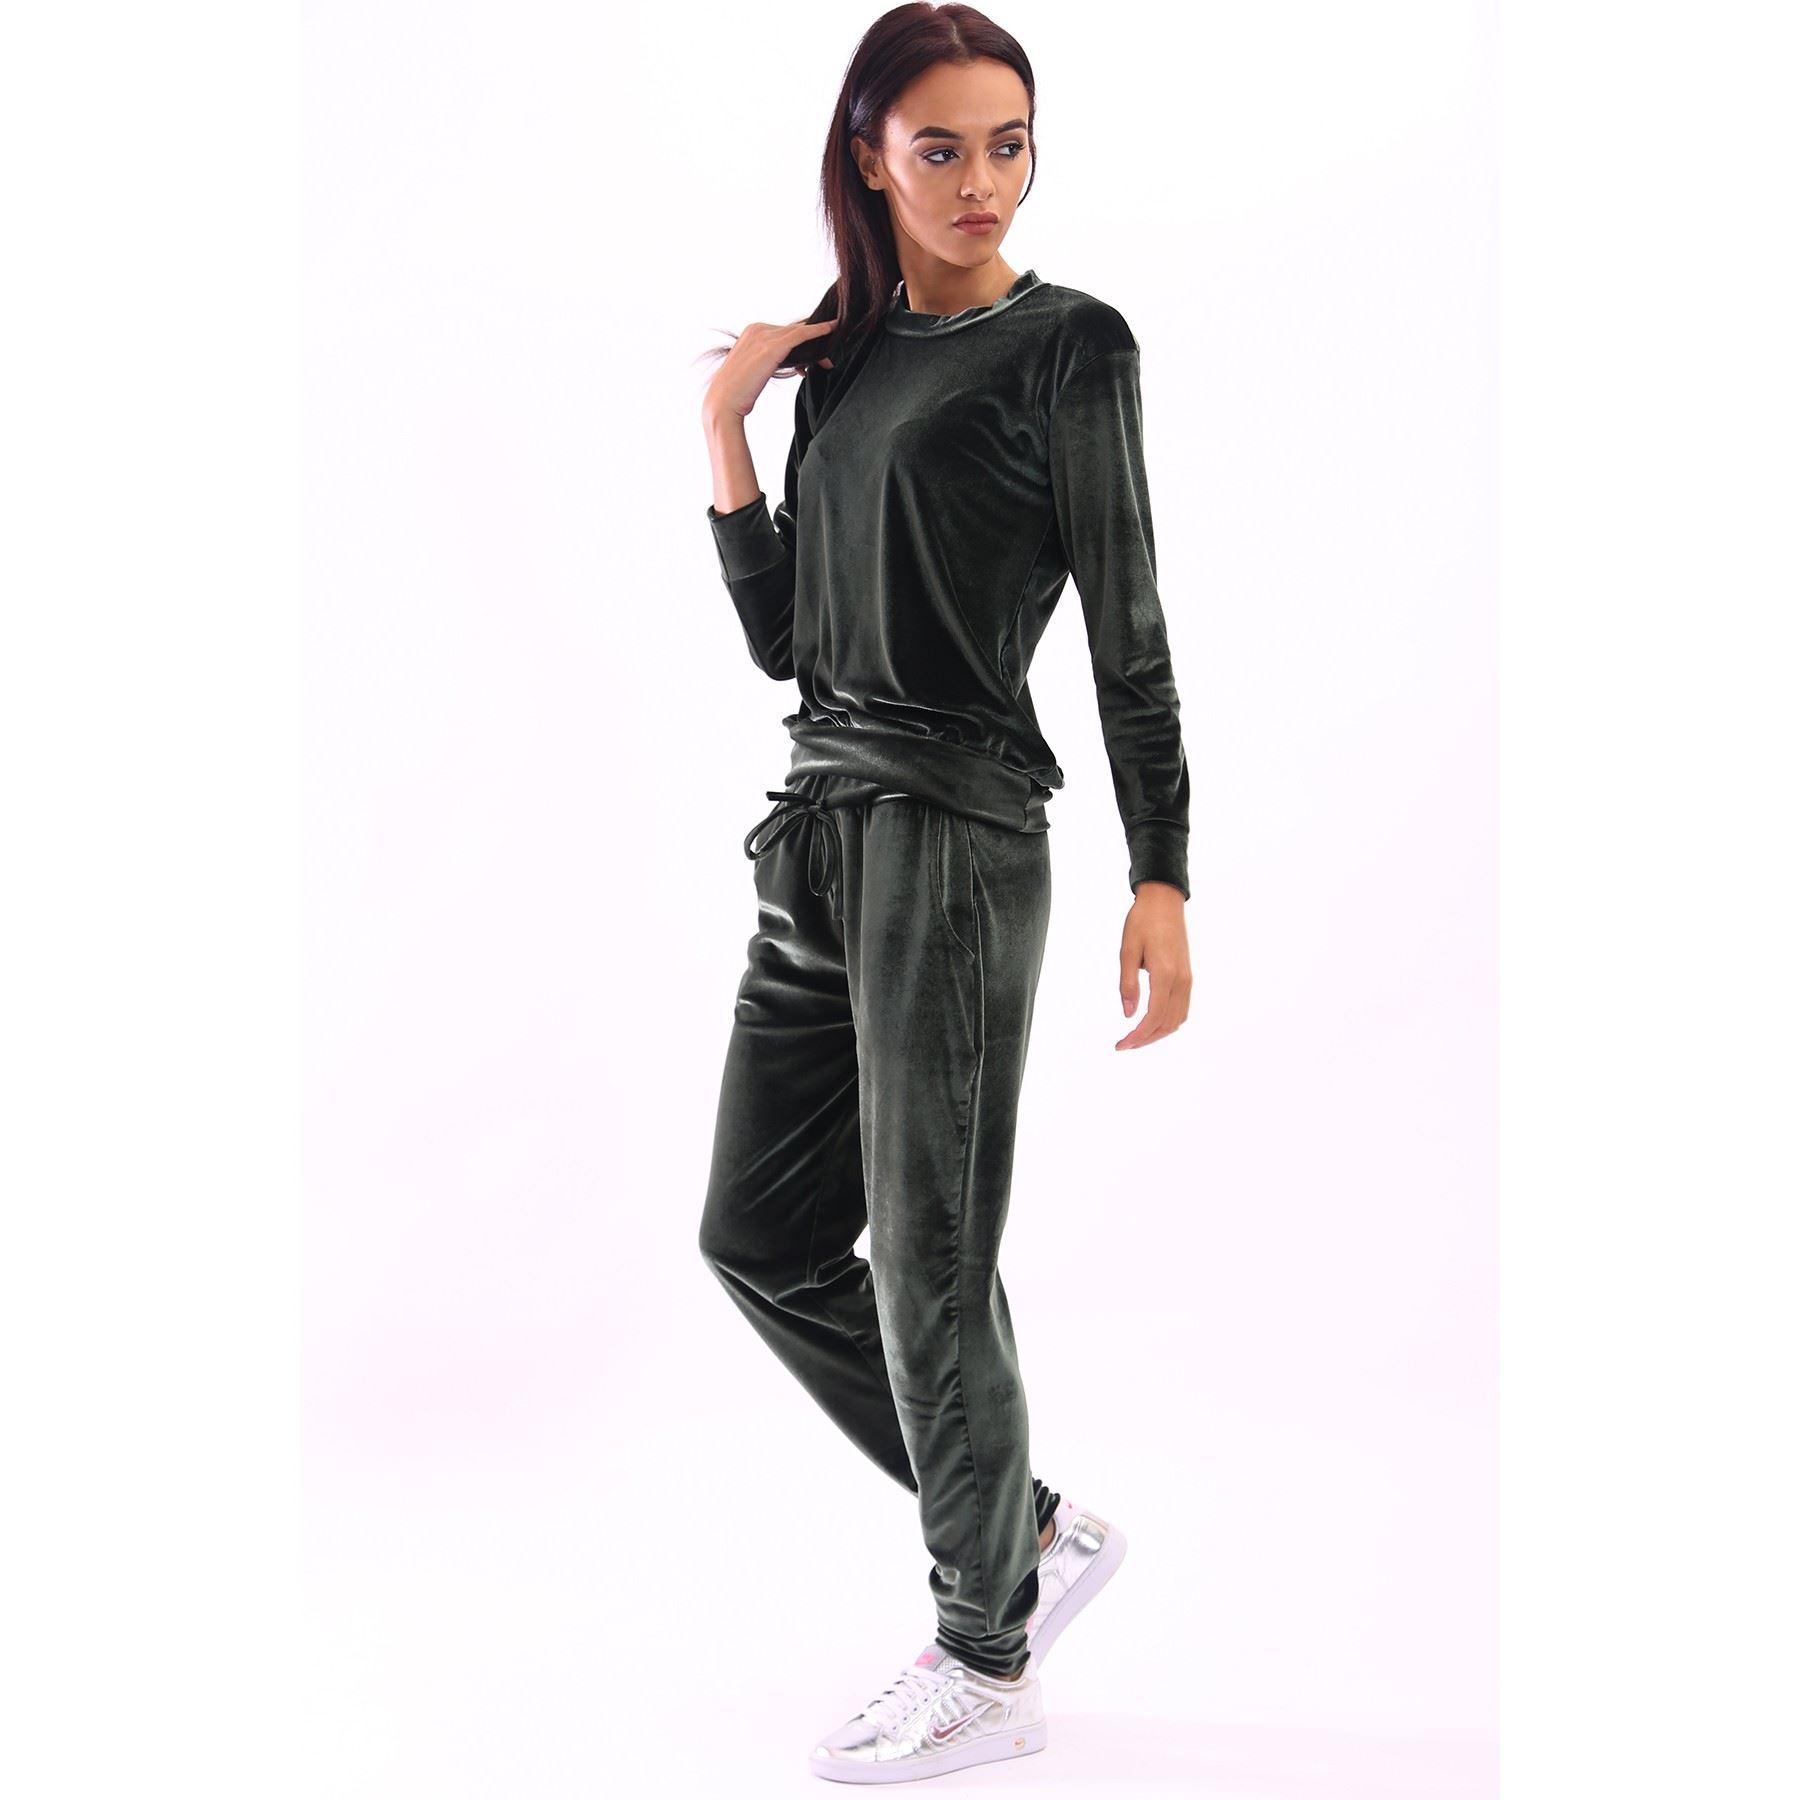 Juicy Couture Womens Velour Hooded Sweatshirt Dress. Sold by BHFO. $ $ Juicy Couture Womens Velour Mini Sweatshirt Dress. Bluelans Women Tracksuit Coat+Pants Casual Sport Suit Hoodie Sweatshirt Fashion Warm. Sold by Bluelans + 1. $ - $ $ - $